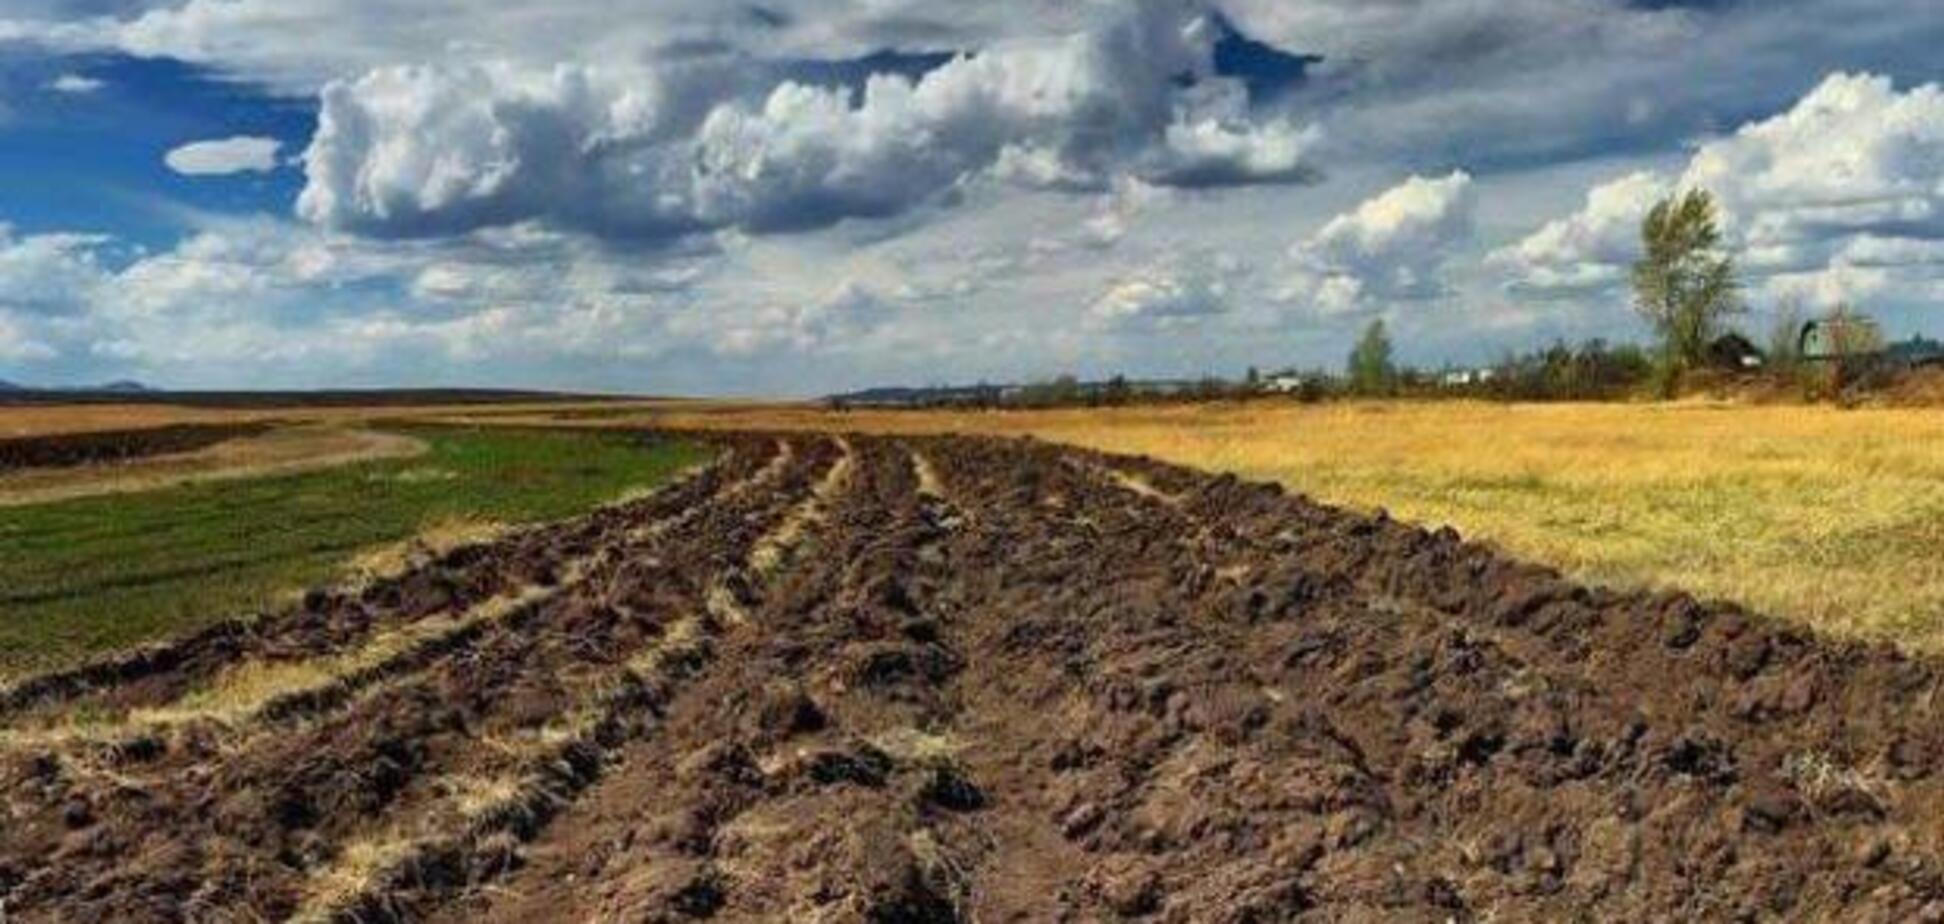 Мораторий на запрет продажи земли: победа оппозиции над ''теневыми'' схемами